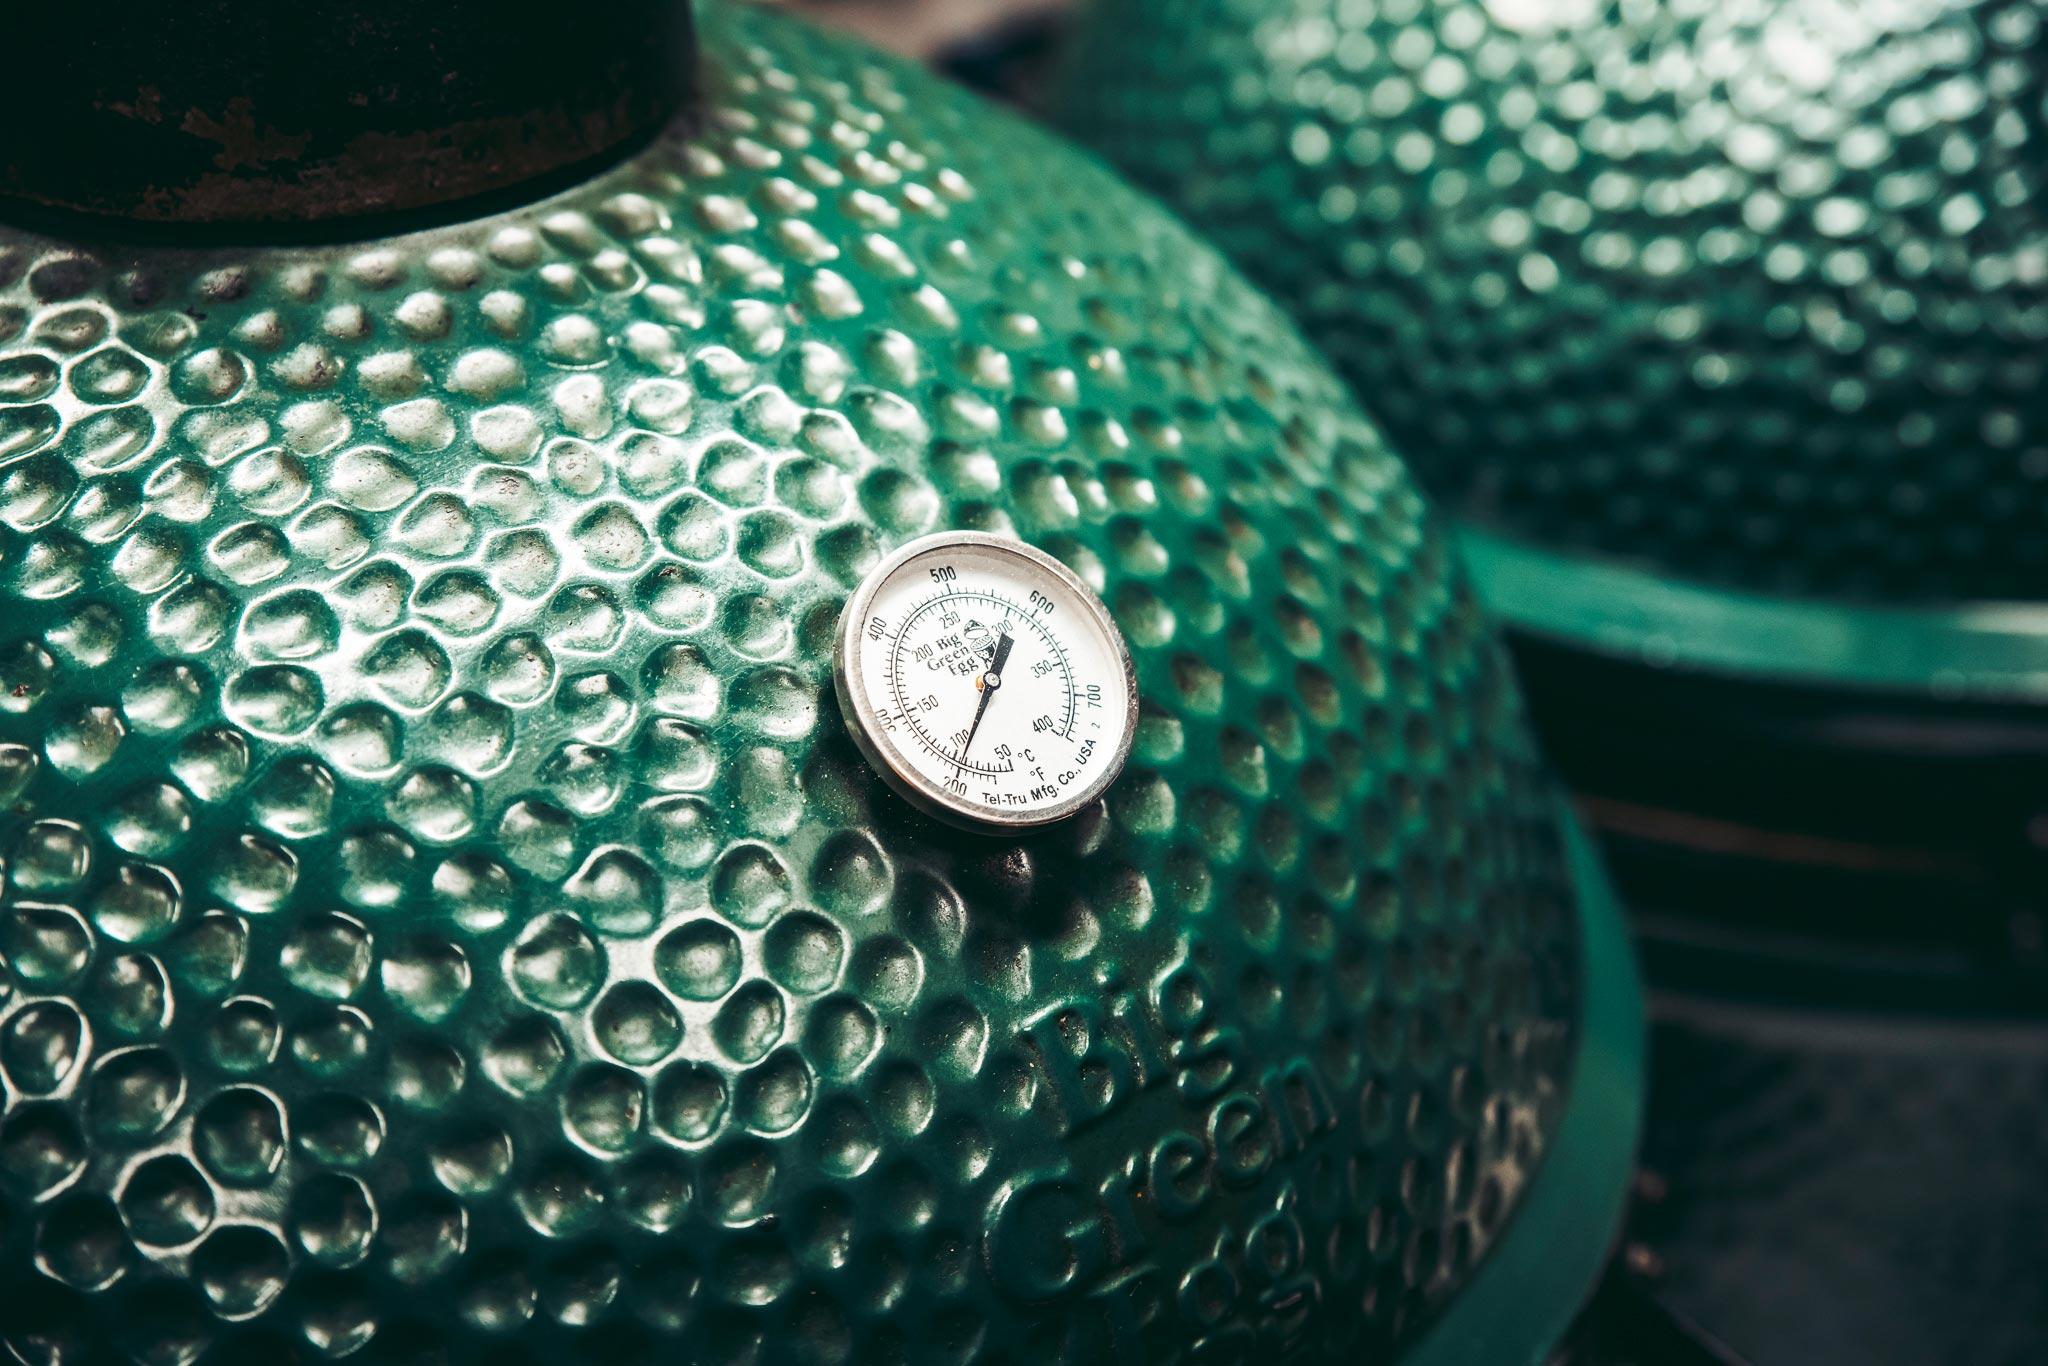 Big Green Egg houtskool barbecue bij restaurant Café Arnhem